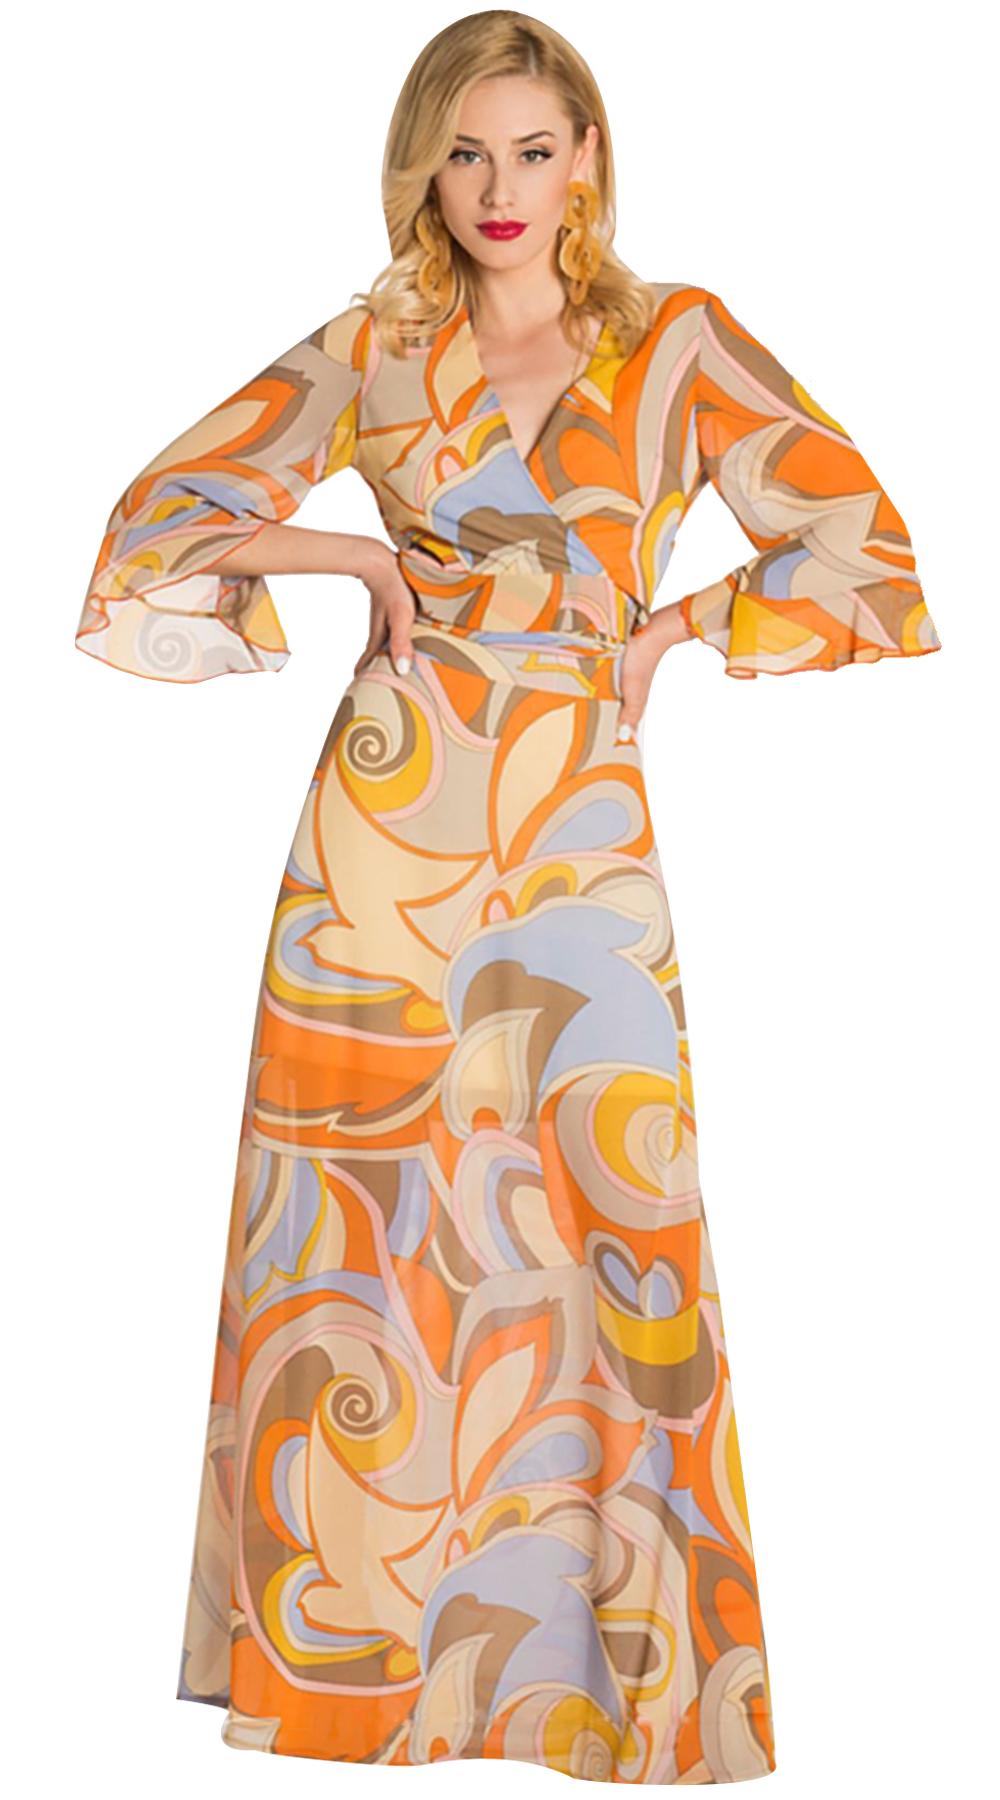 d7385e8f352e Γυναικείες Μπλούζες - Miss Reina